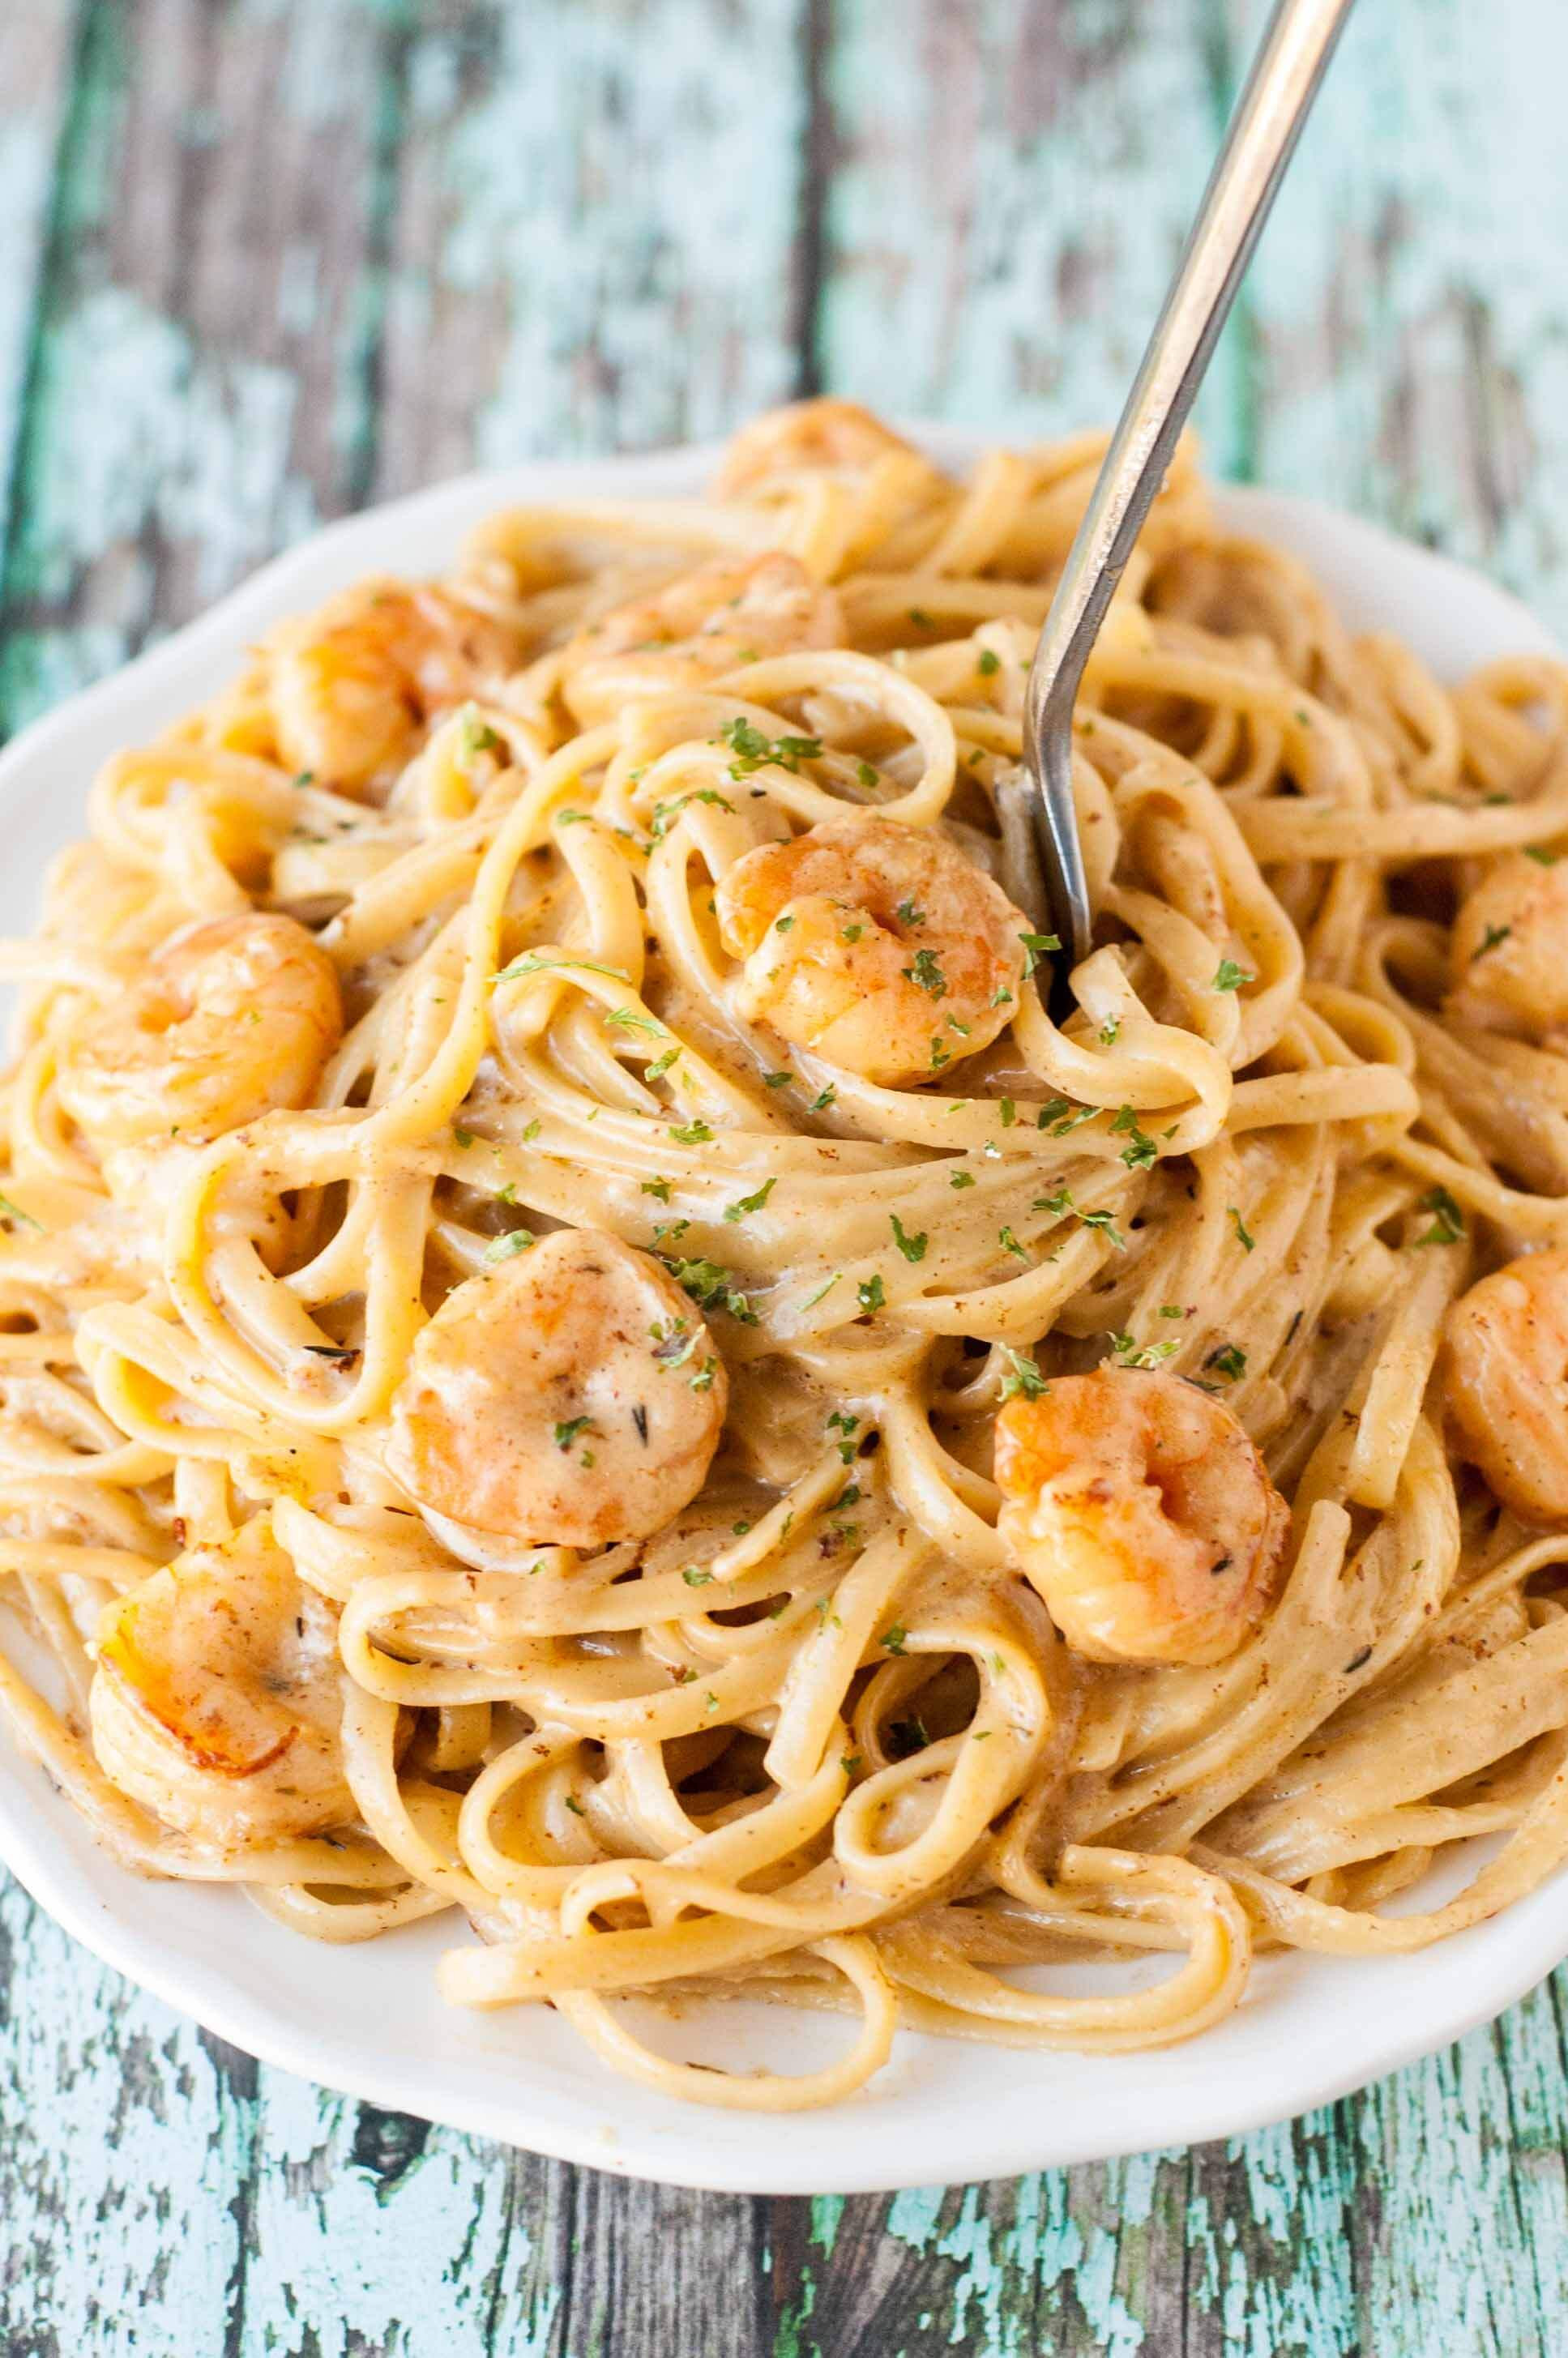 Shrimp Recipes With Pasta  Cajun Shrimp Pasta Slow Cooker Gourmet